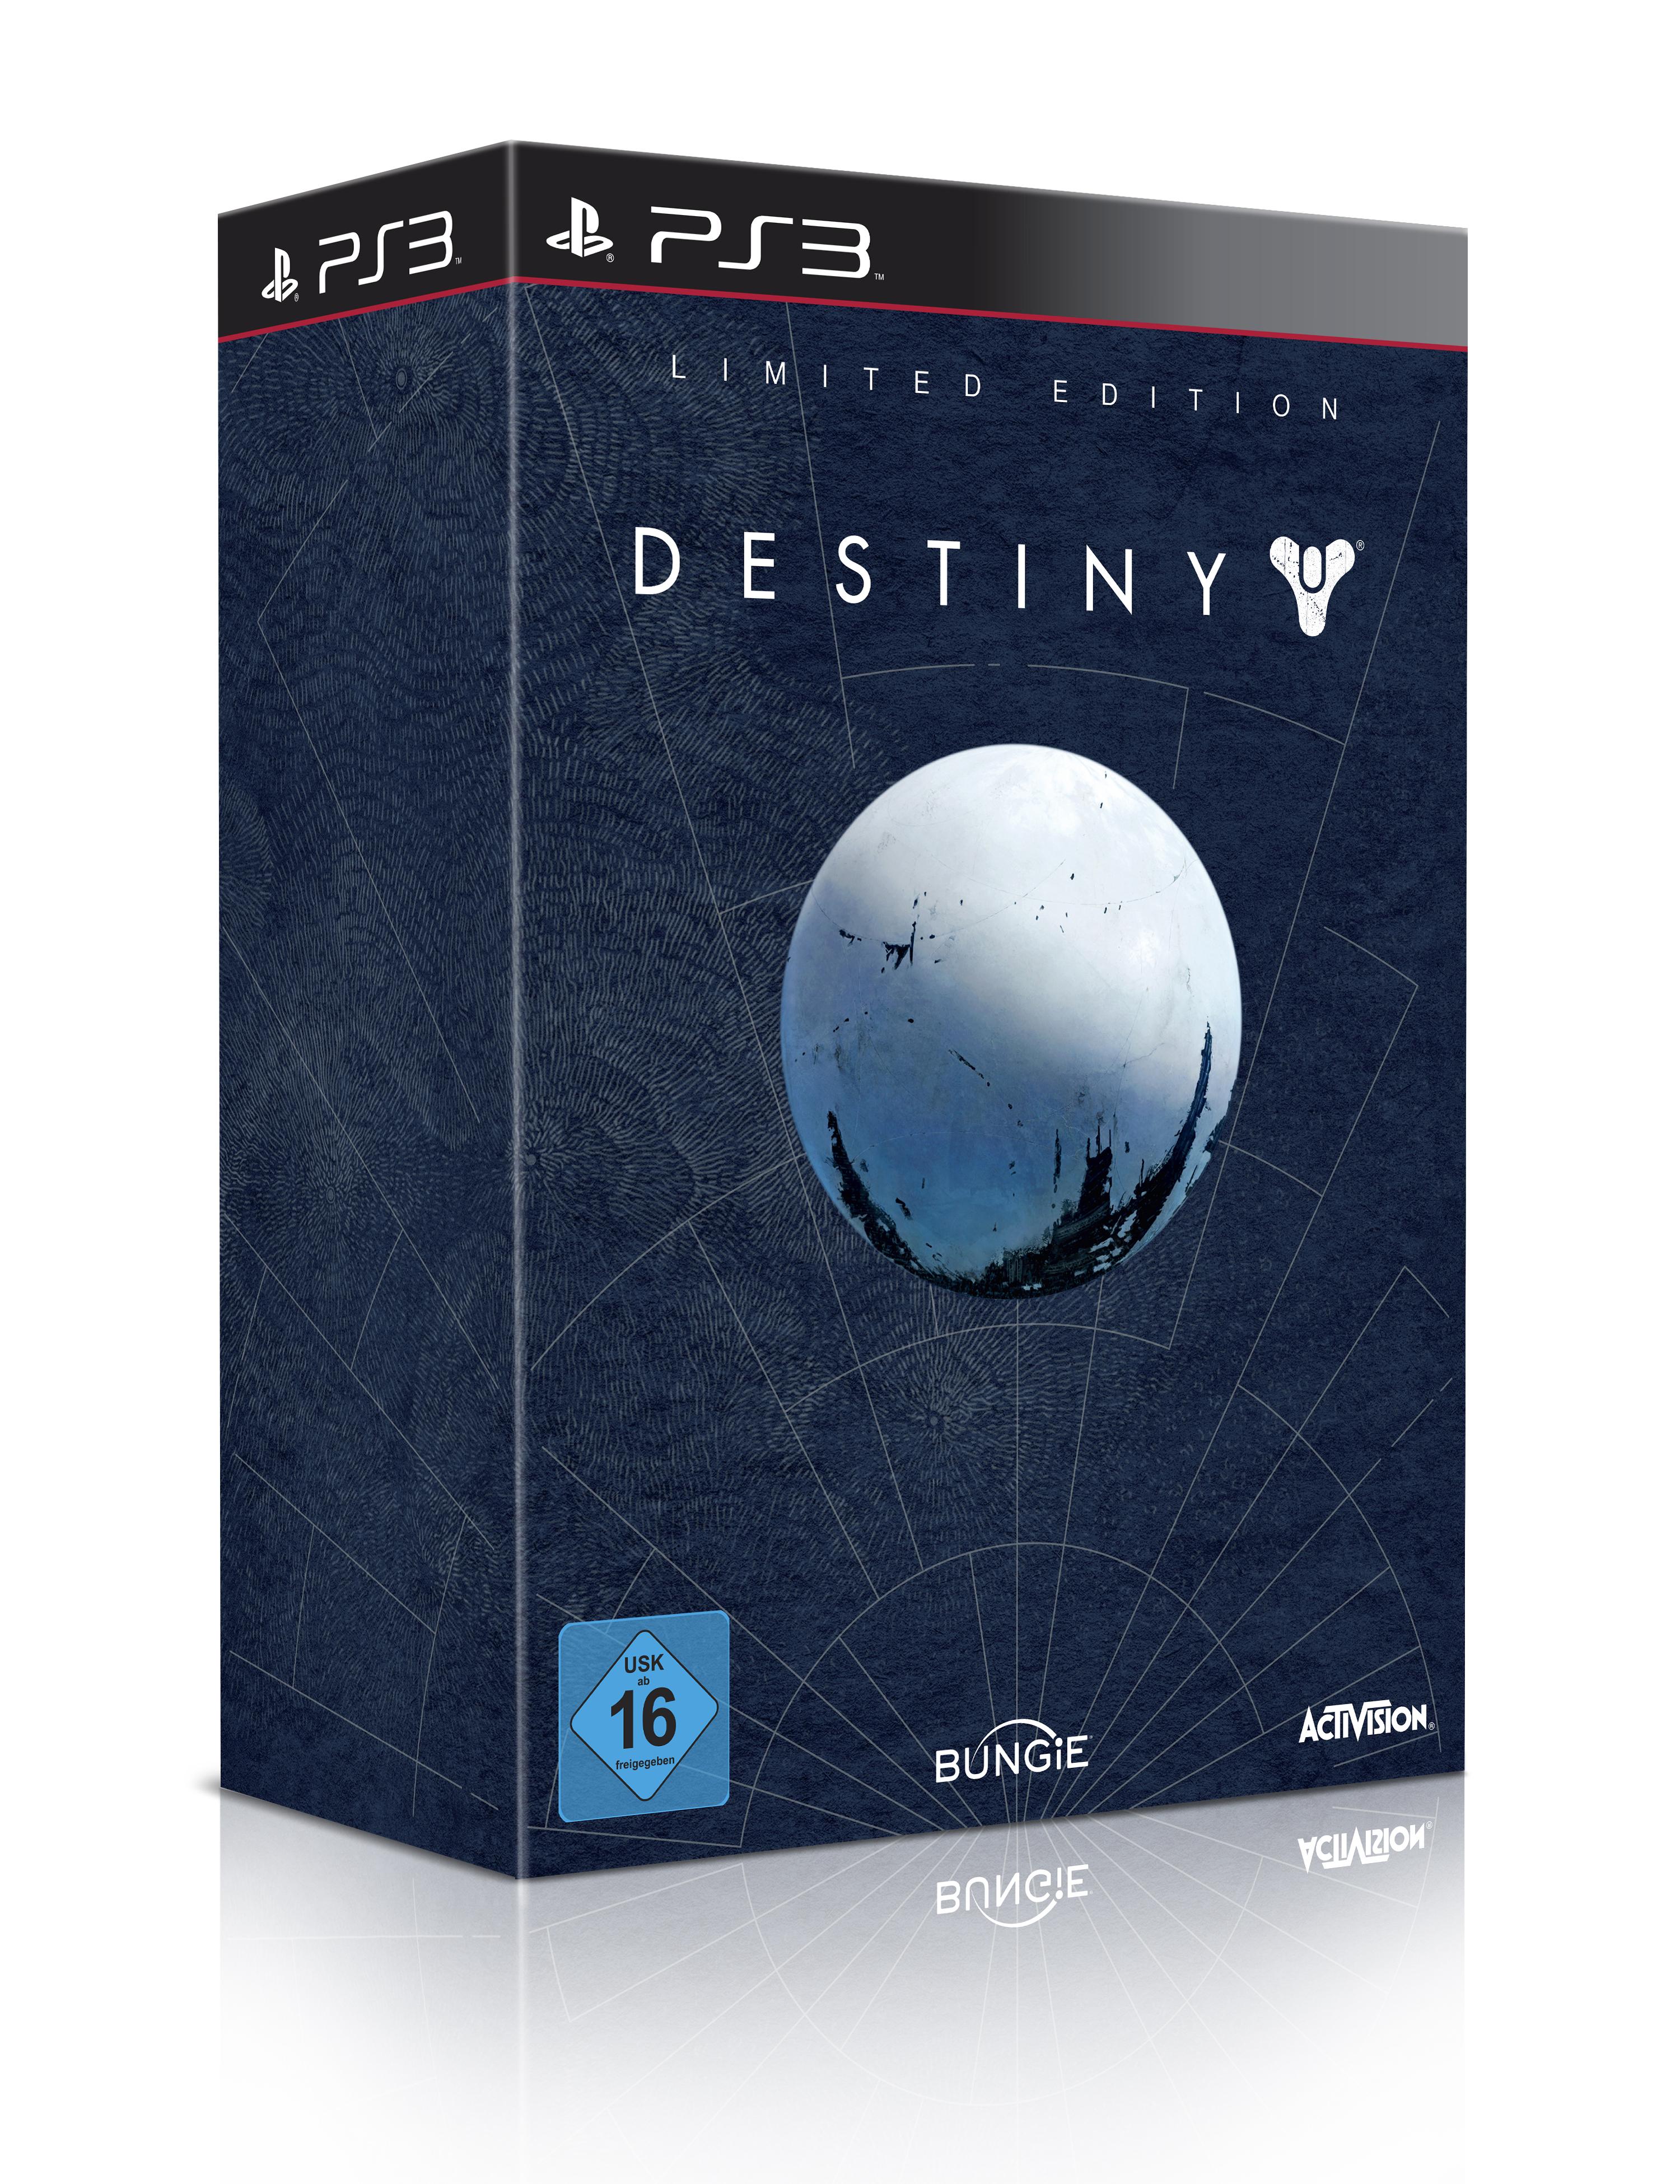 Destiny Limited Edition Packshot 3D